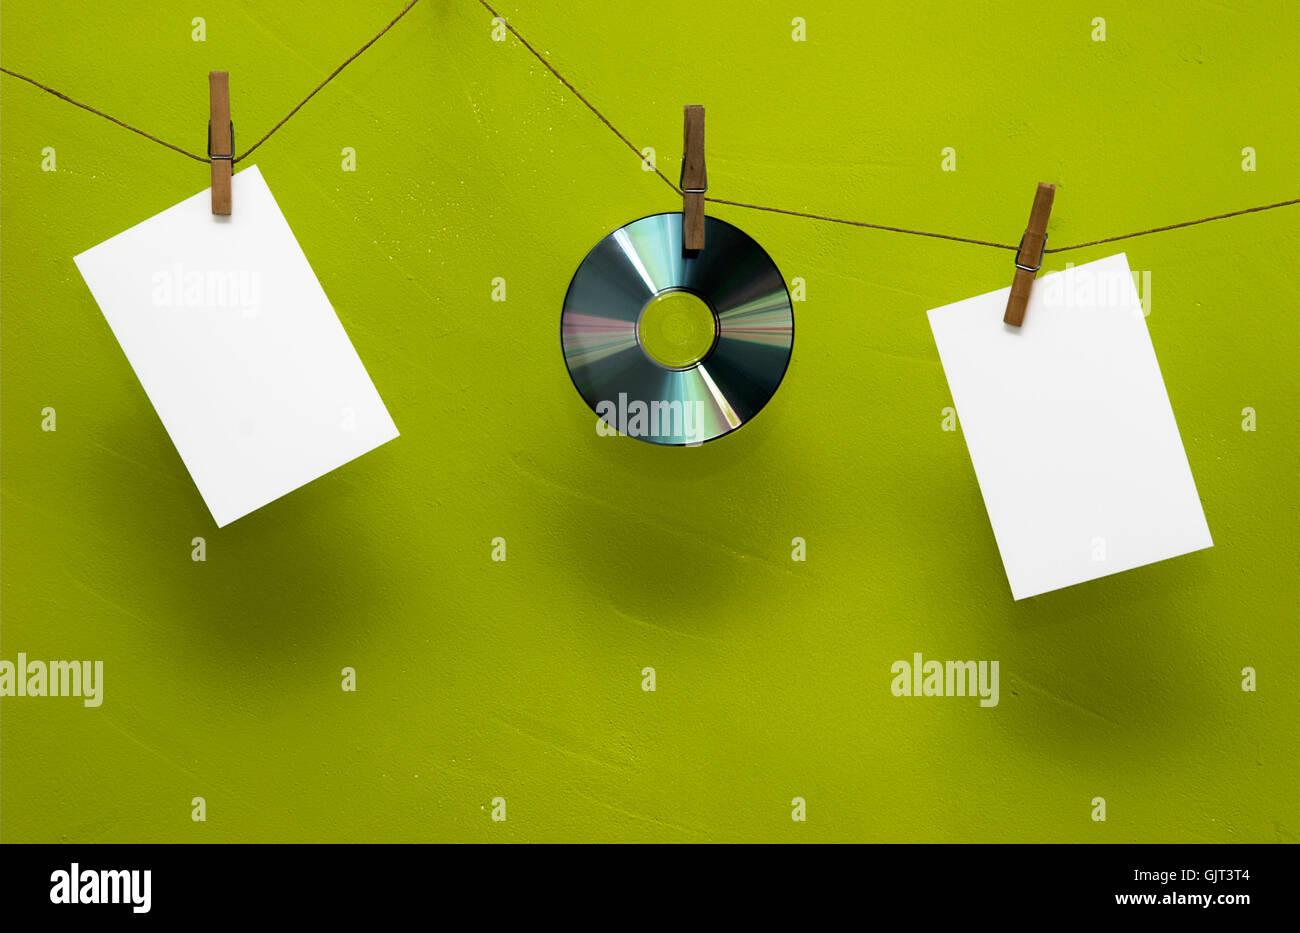 wall photography photo - Stock Image